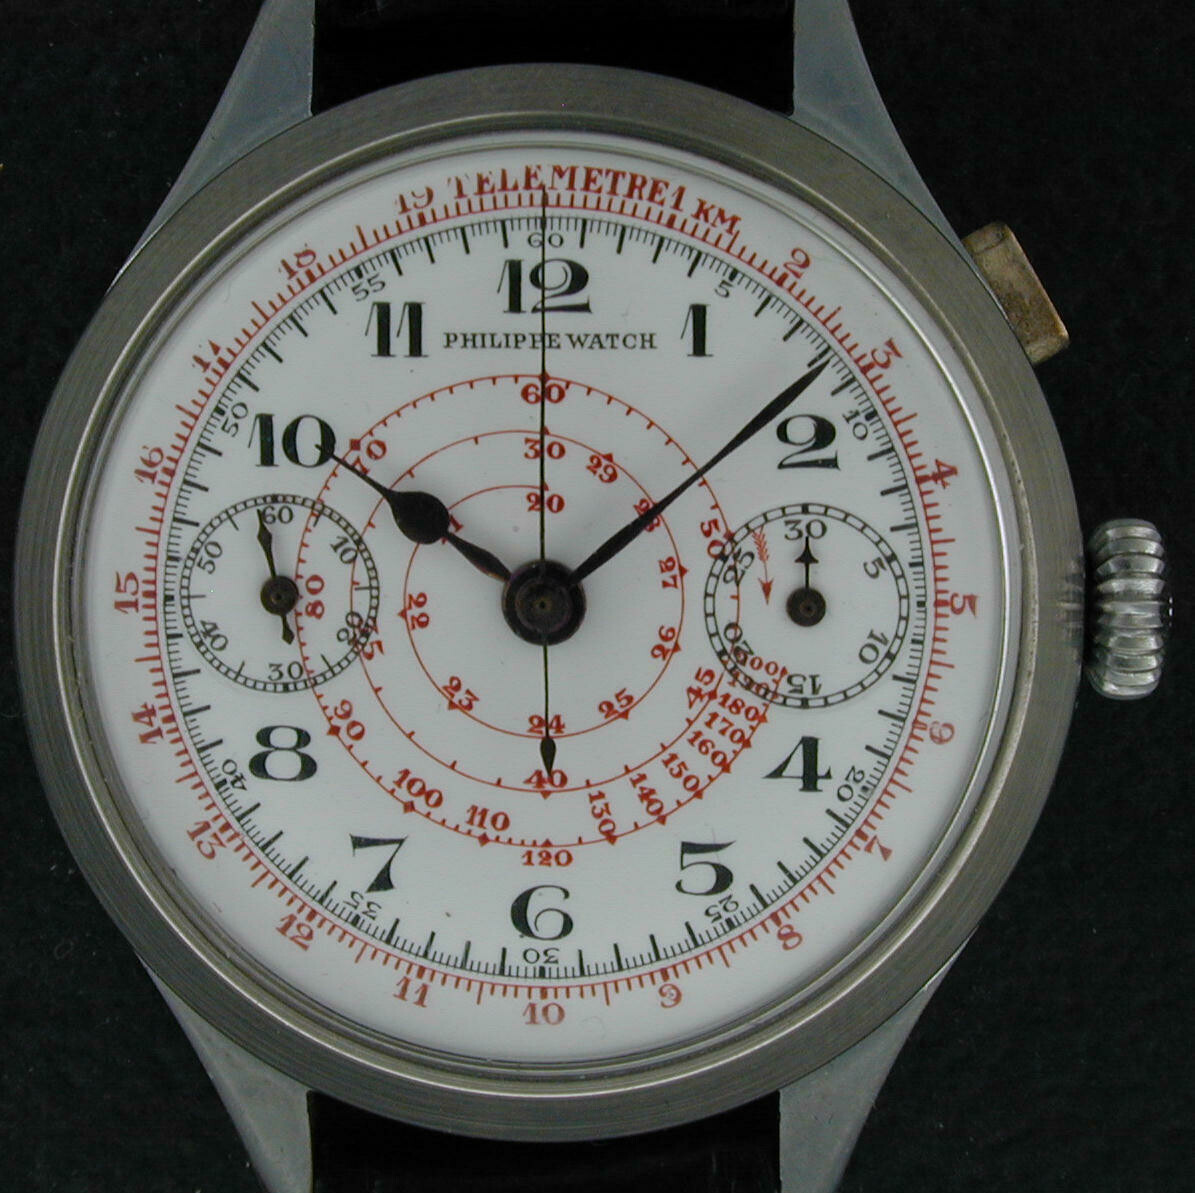 Philippe Single Button Chronograph Porcelain dial#171239